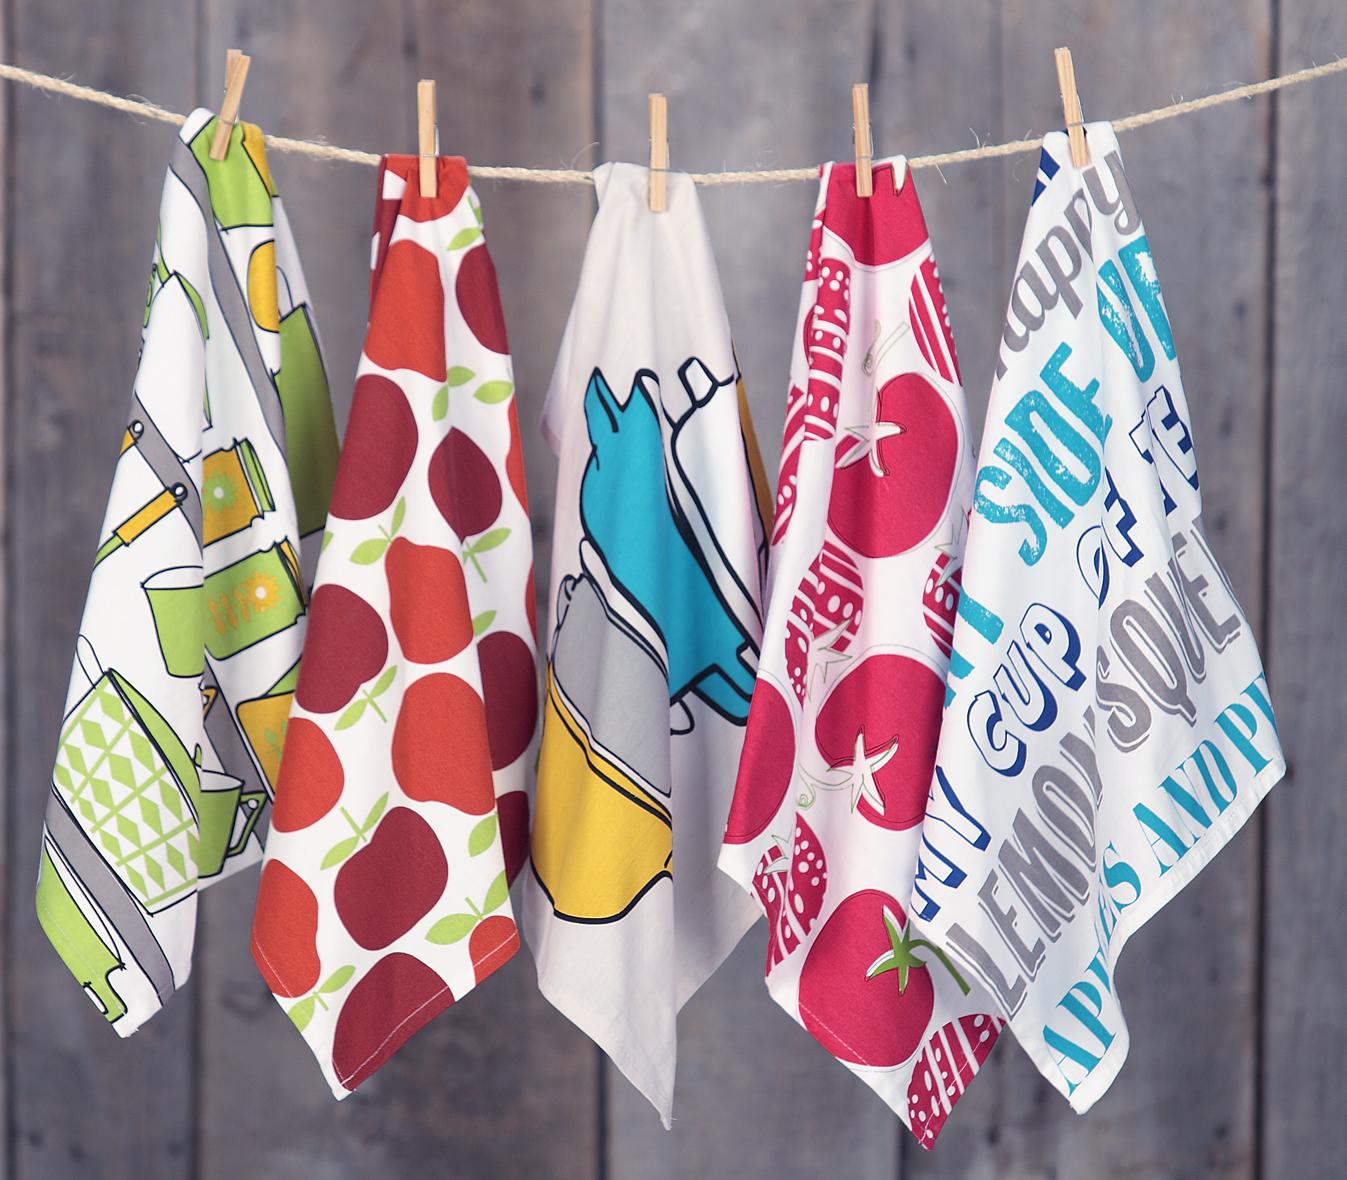 Towels Hanging sm.jpg